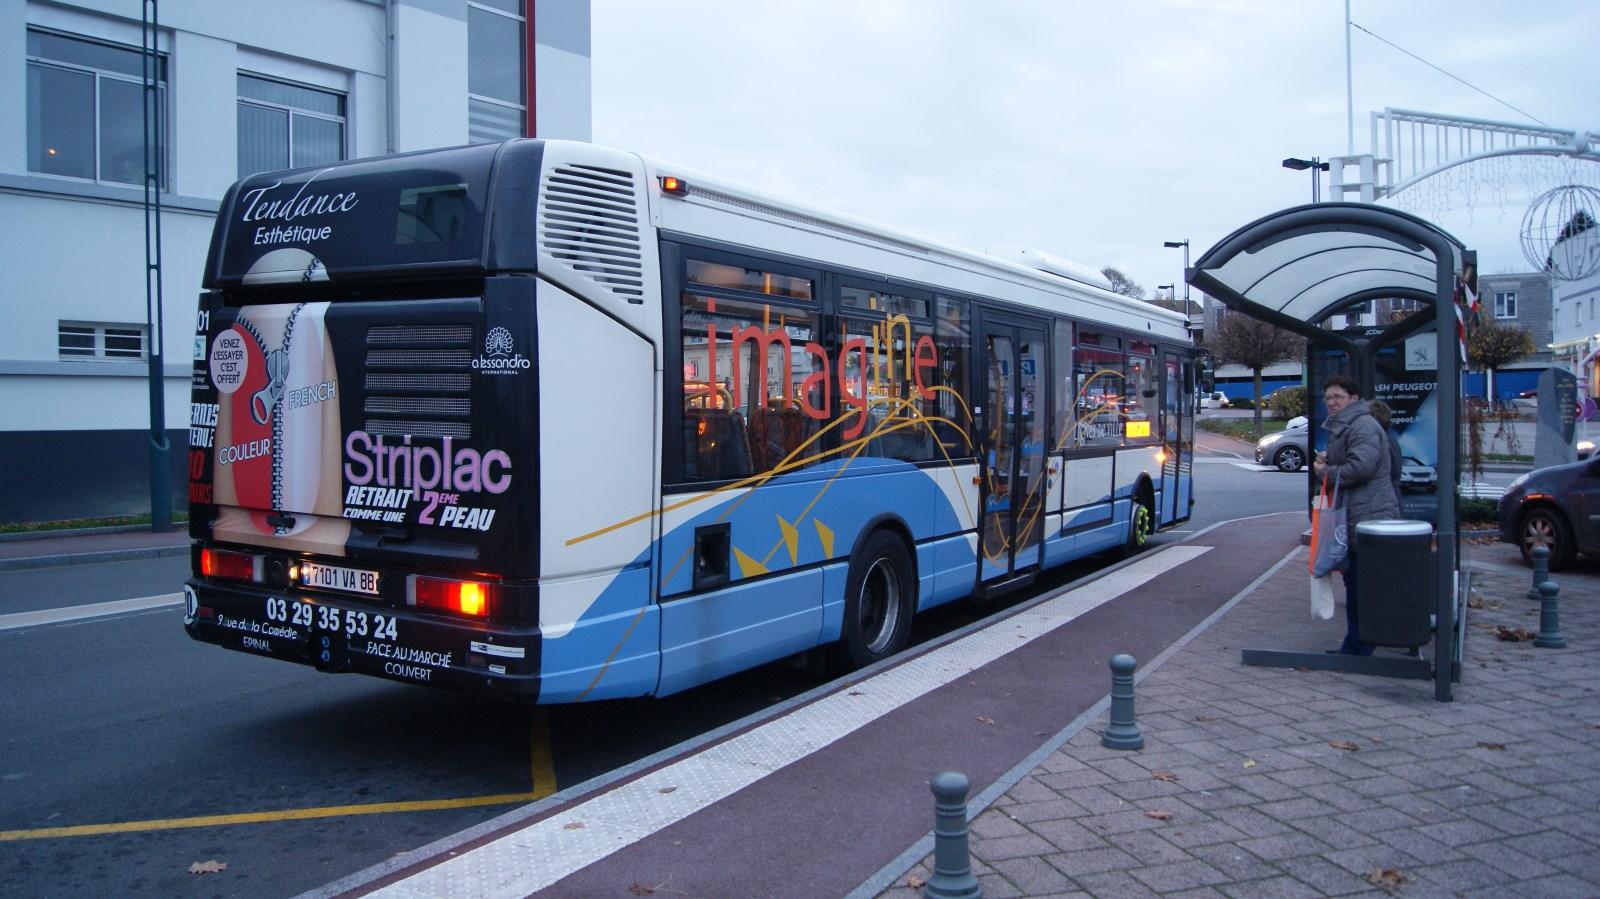 Irisbus Agora S n° 101 - Page 3 Dsc06983